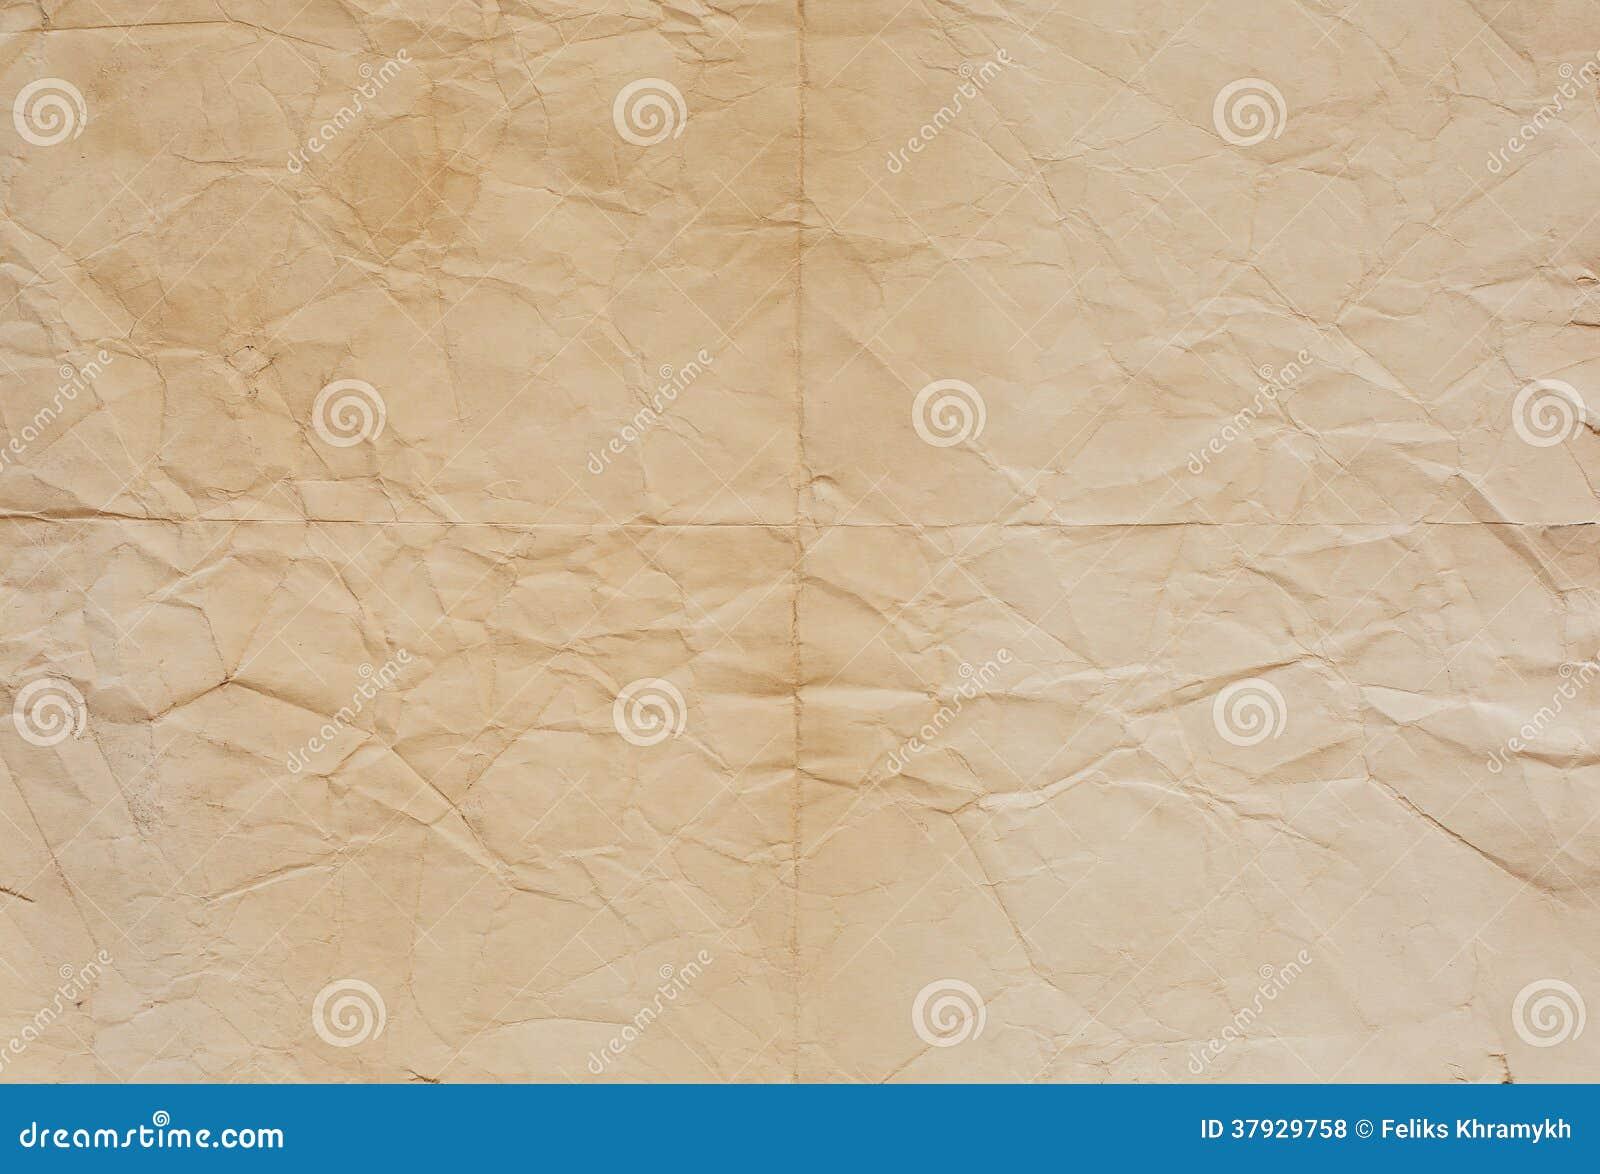 Старая бумажная текстура с линиями залома